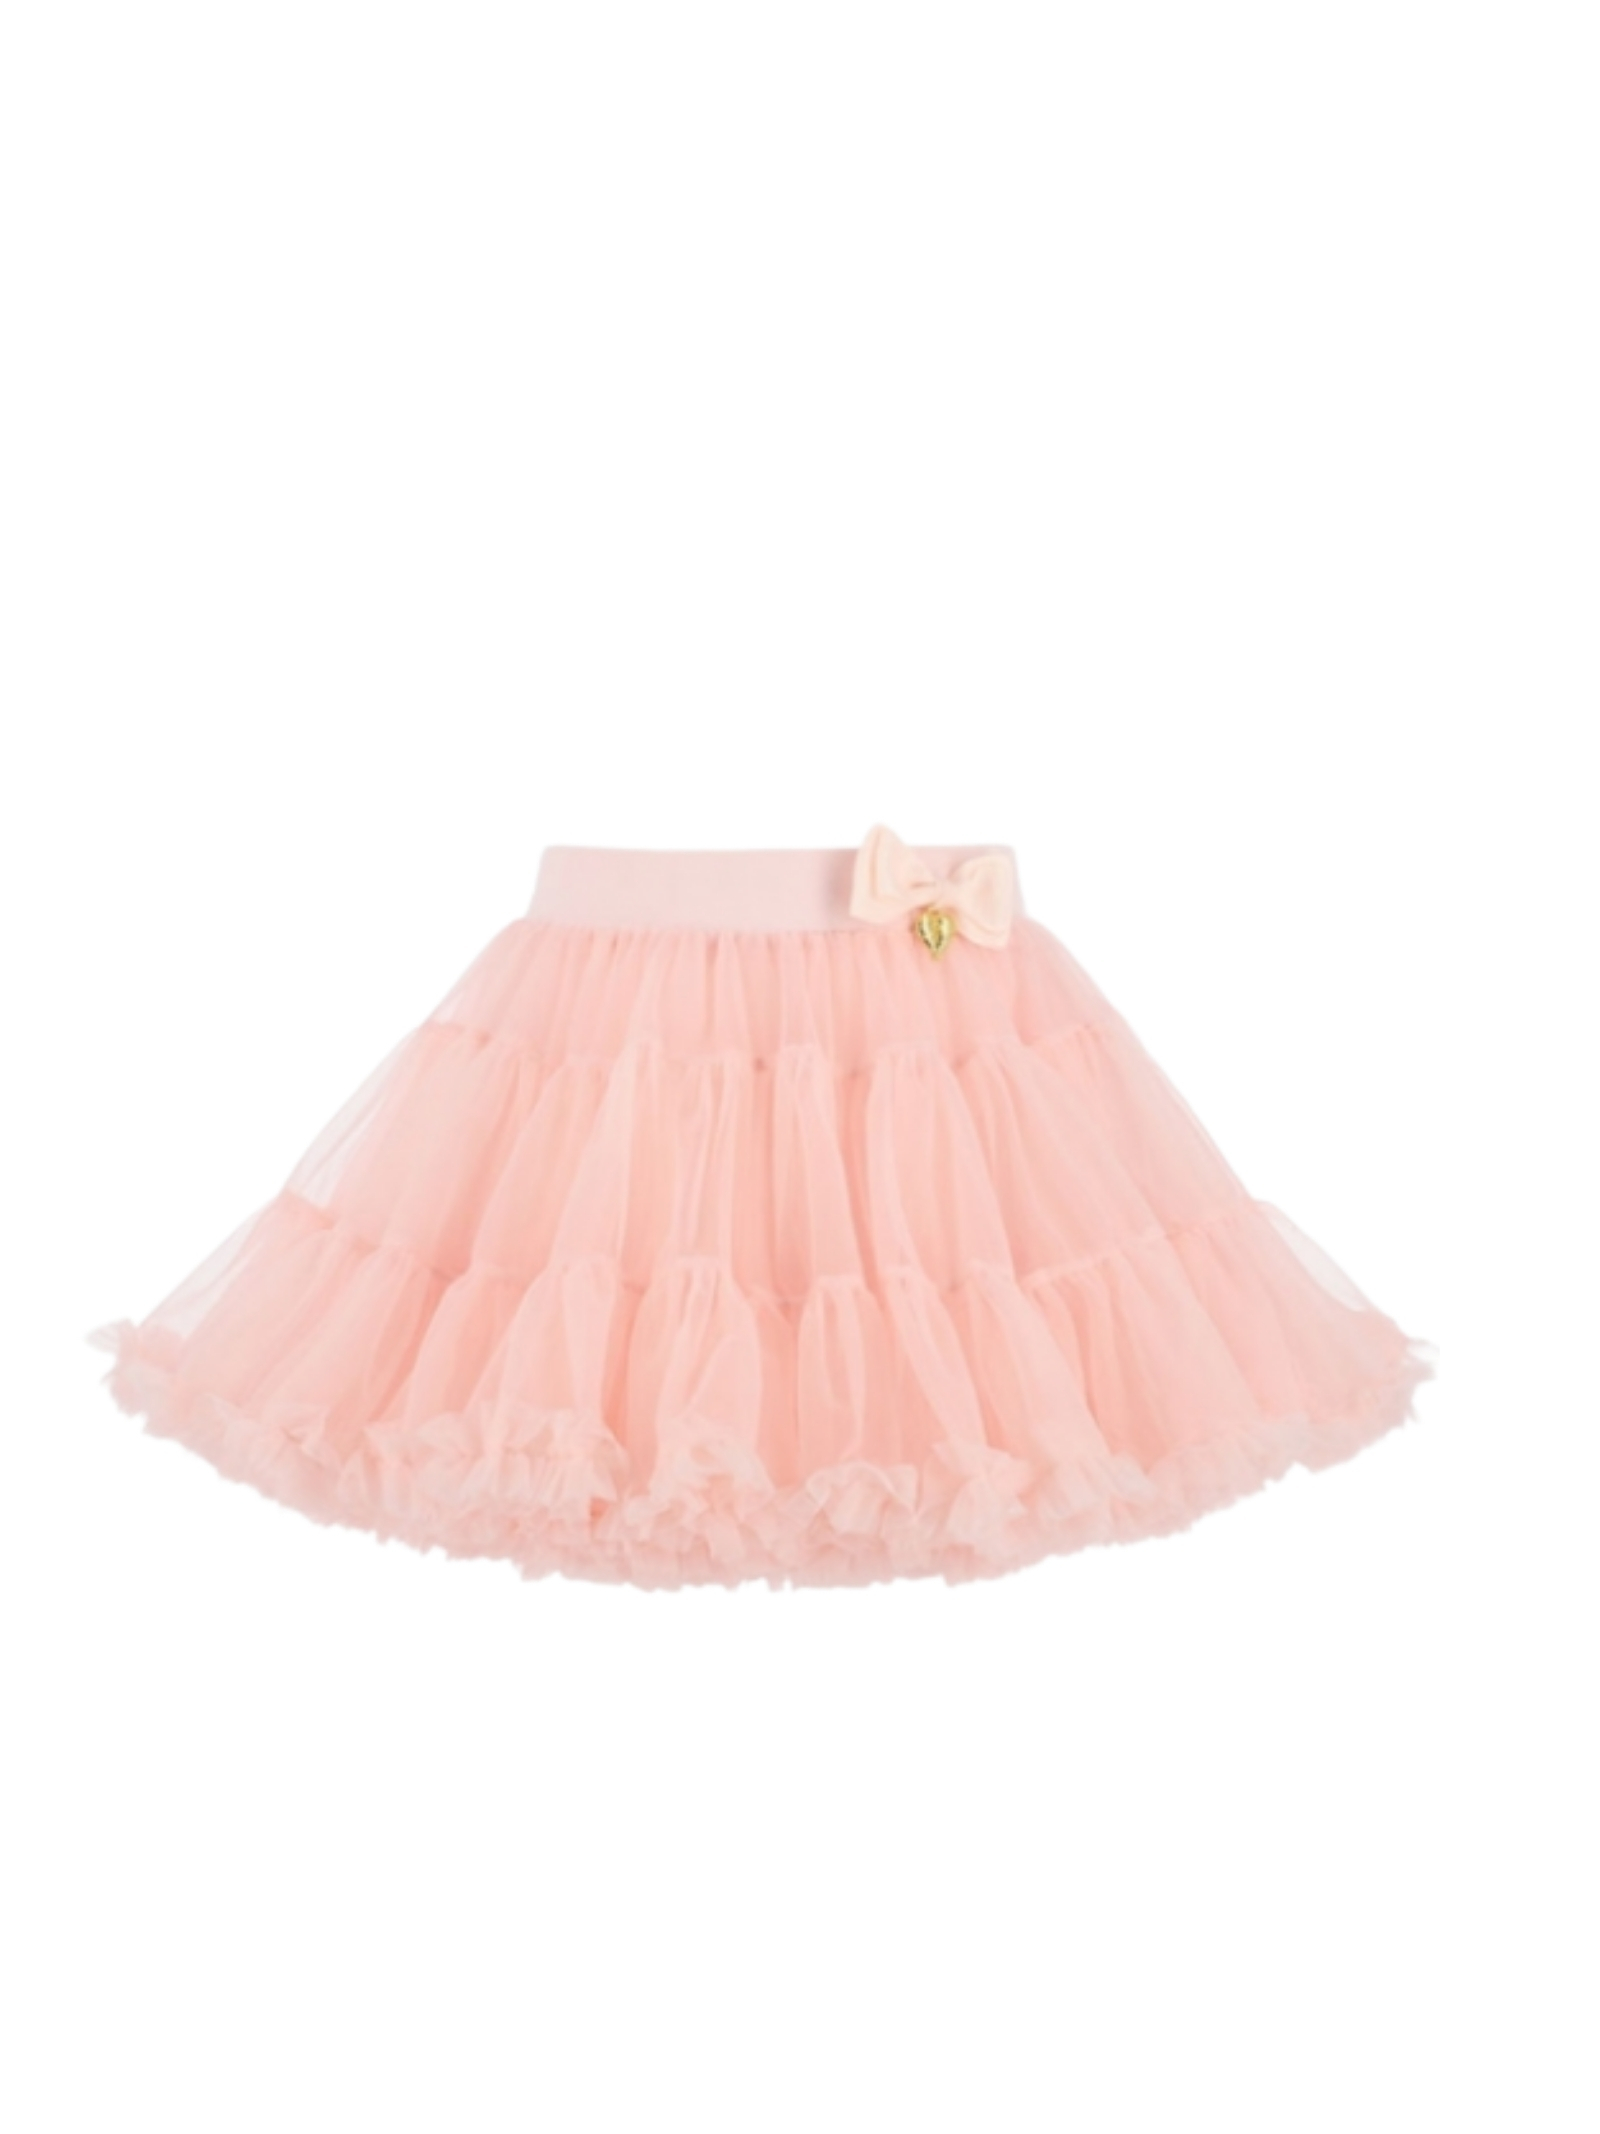 Gonna Bambina Tutu Pixie Ballet Pink ANGEL'S FACE | Gonne | PIXIEBALLET PINK